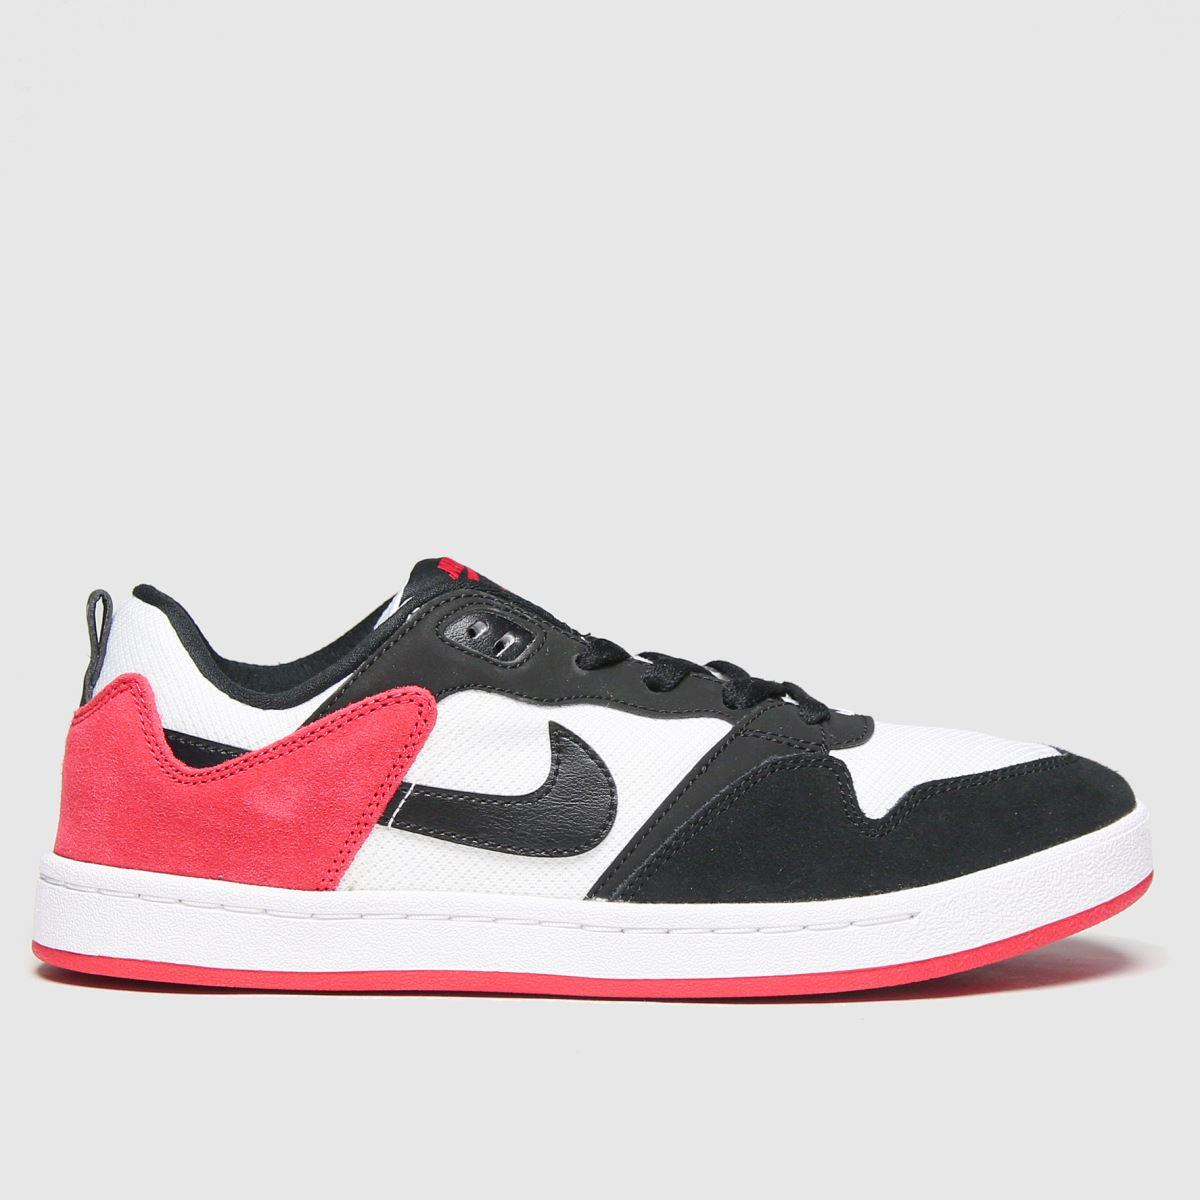 Nike SB Nike SB Black & Red Sb Alleyoop Trainers